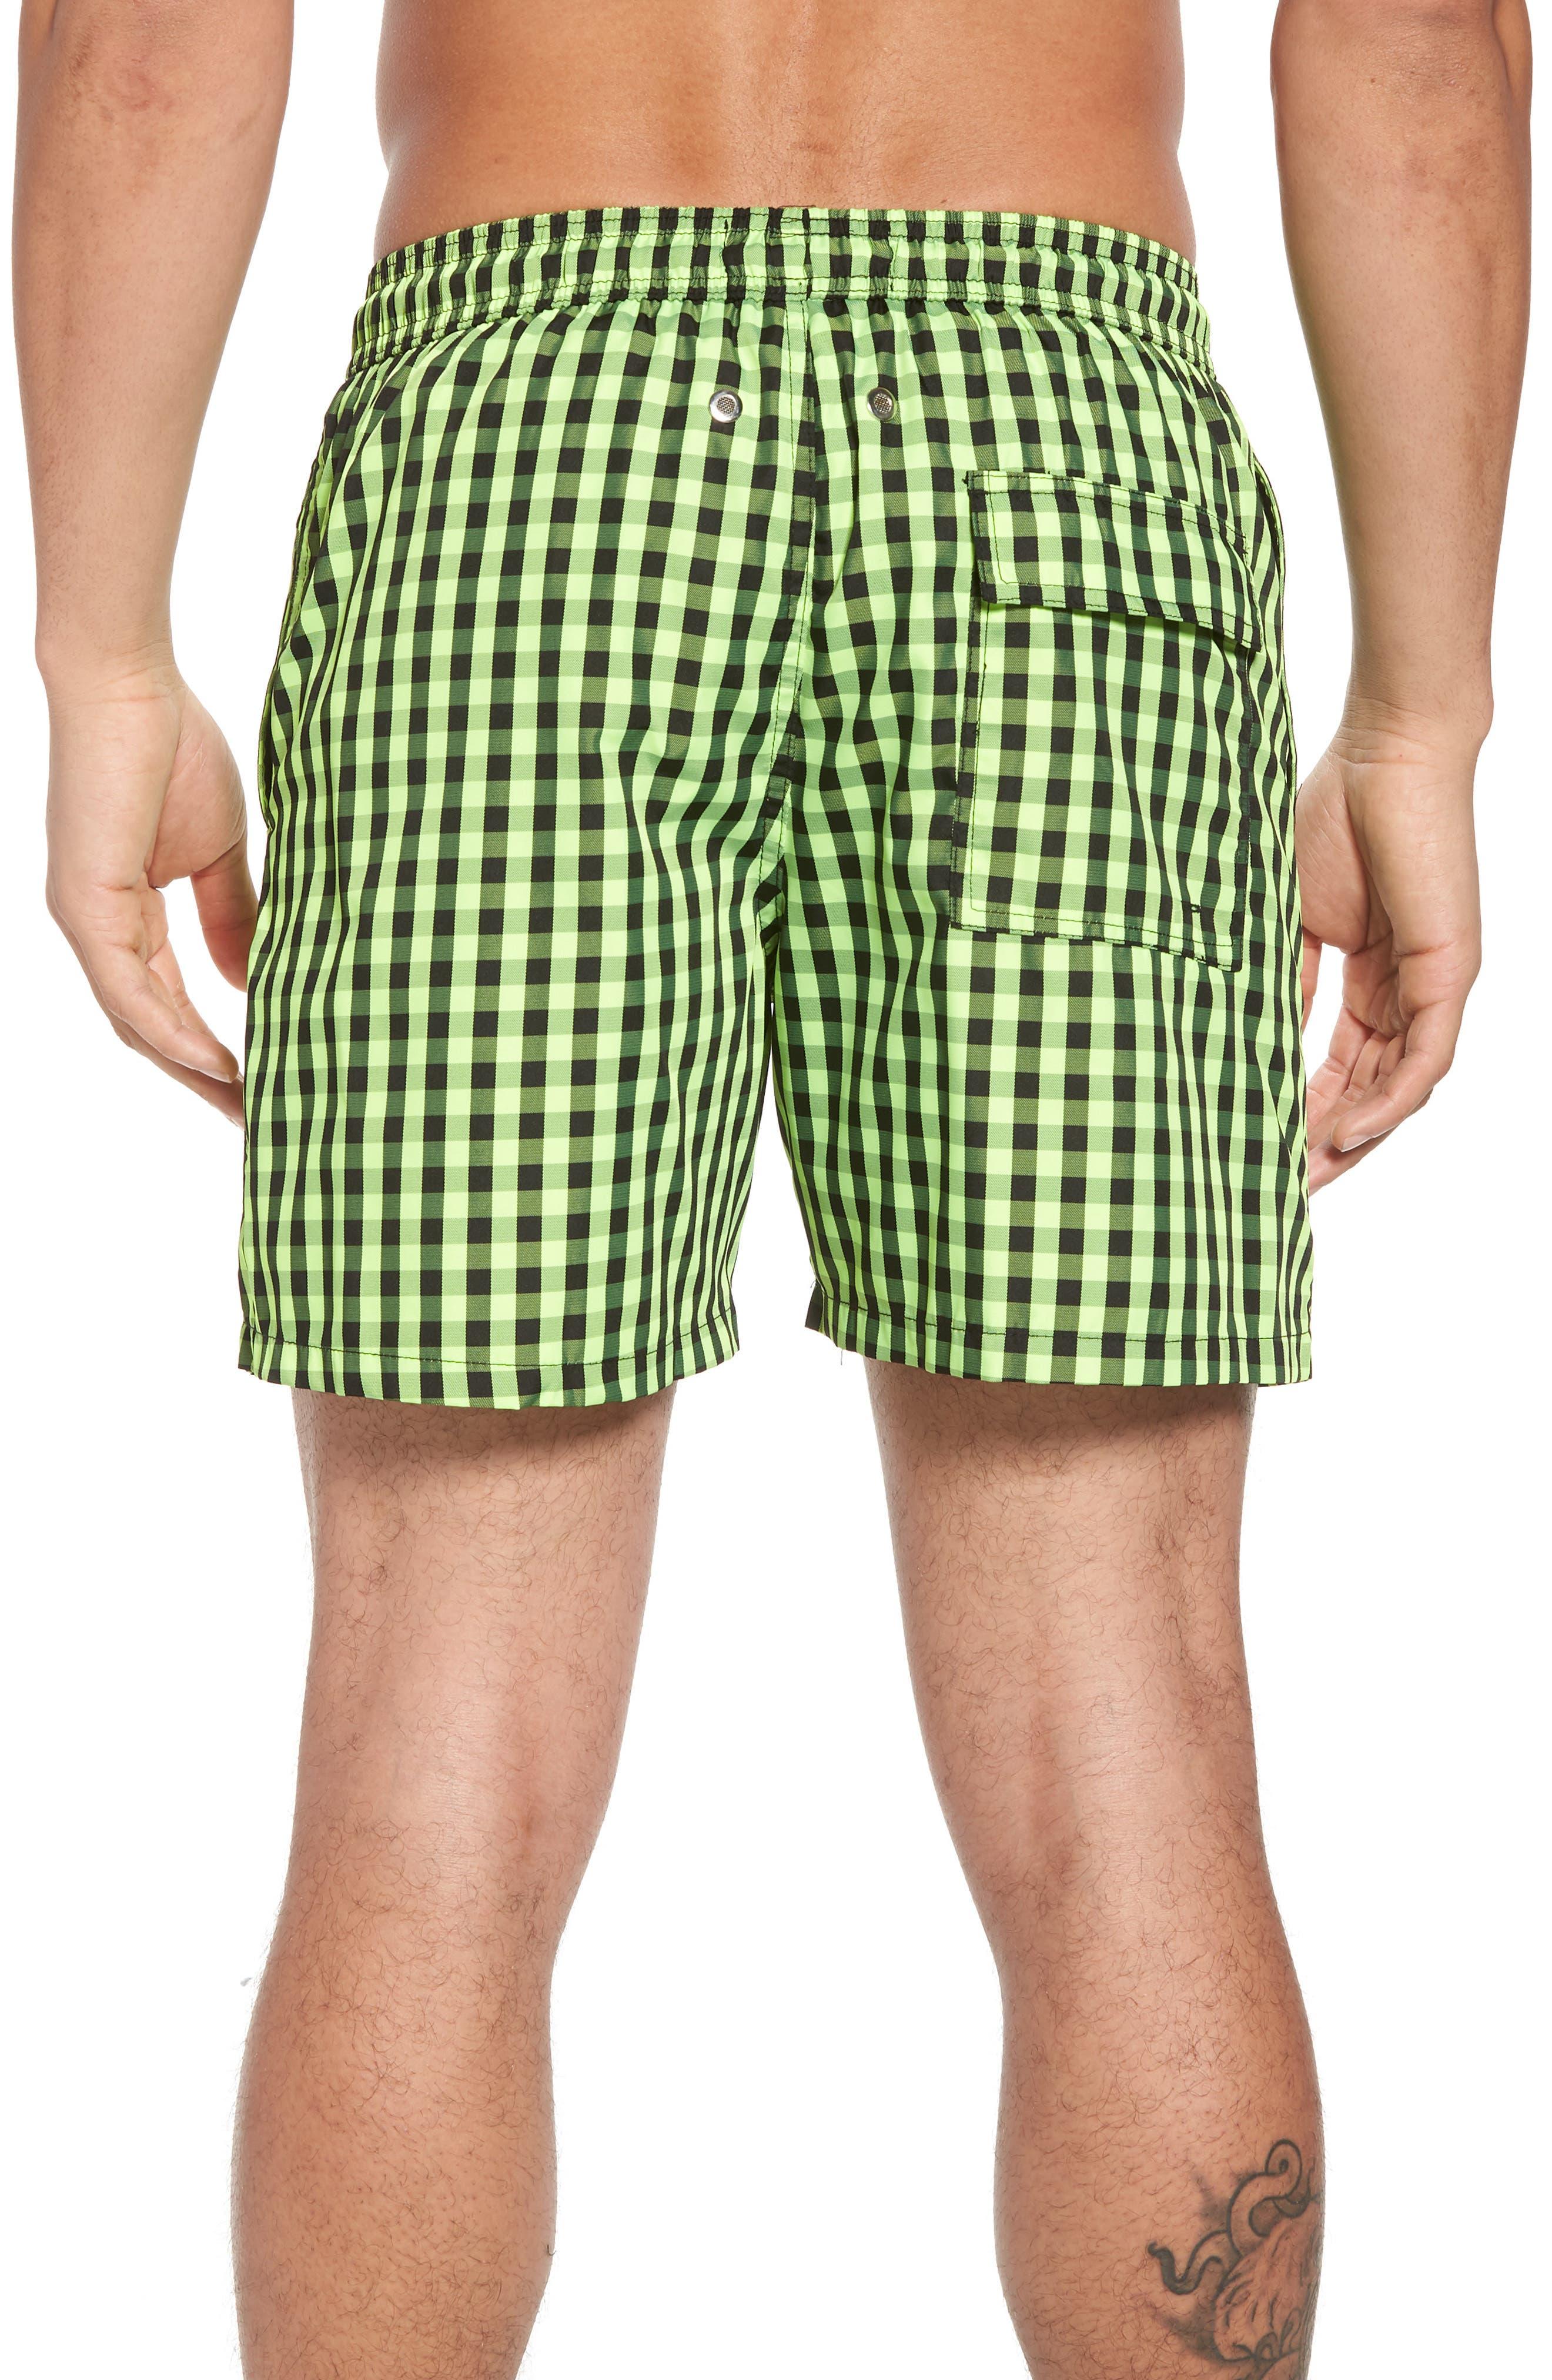 Trim Fit Swim Shorts,                             Alternate thumbnail 2, color,                             300